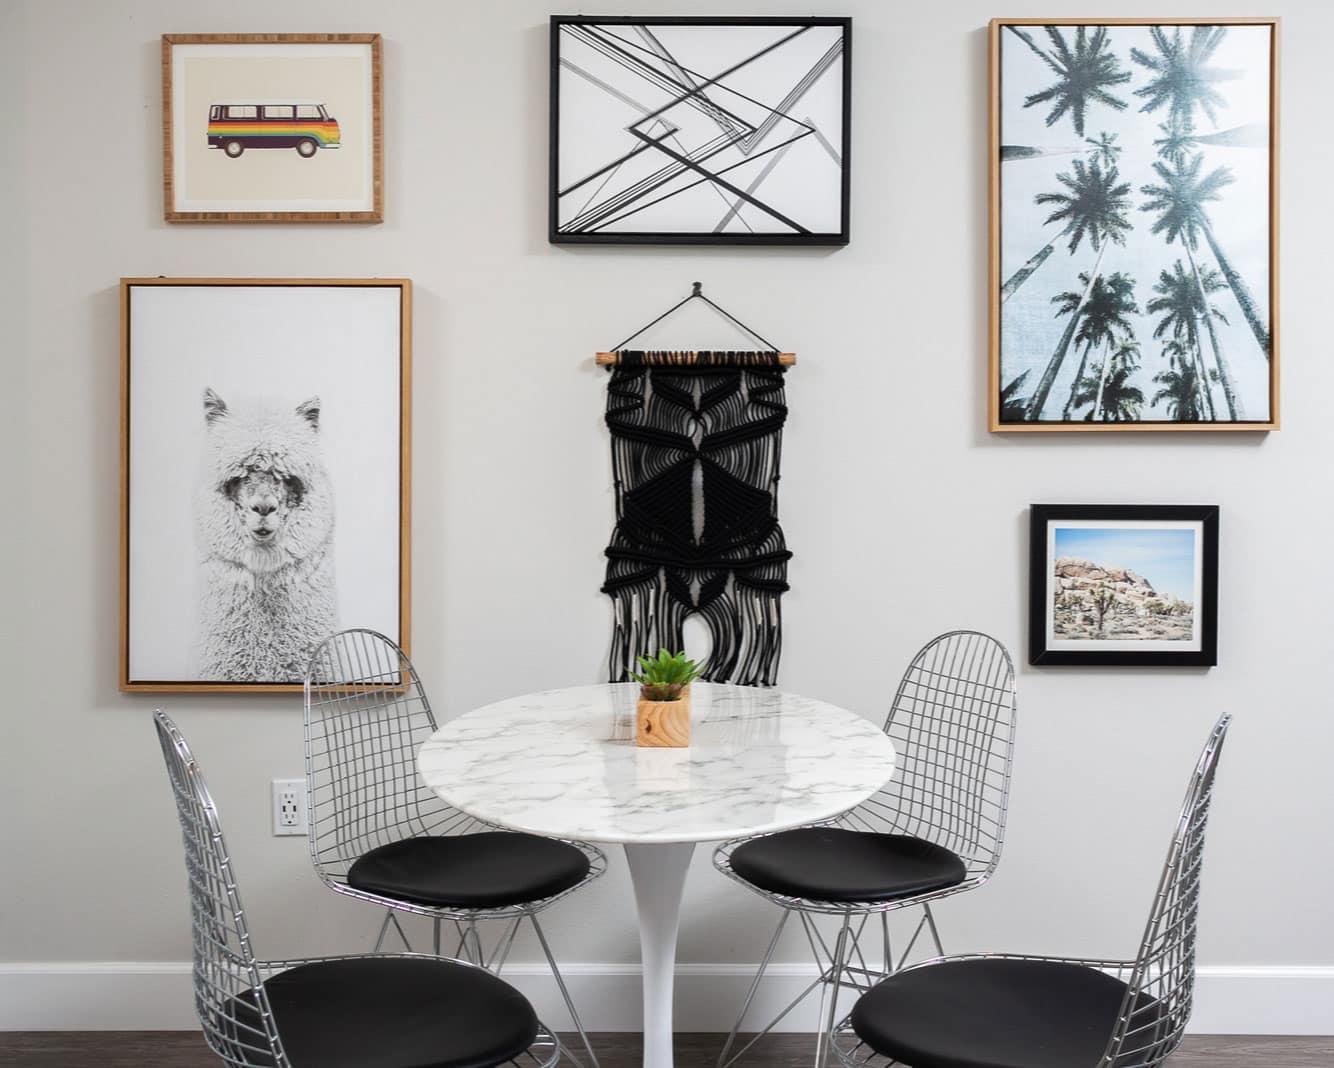 Apartment-living